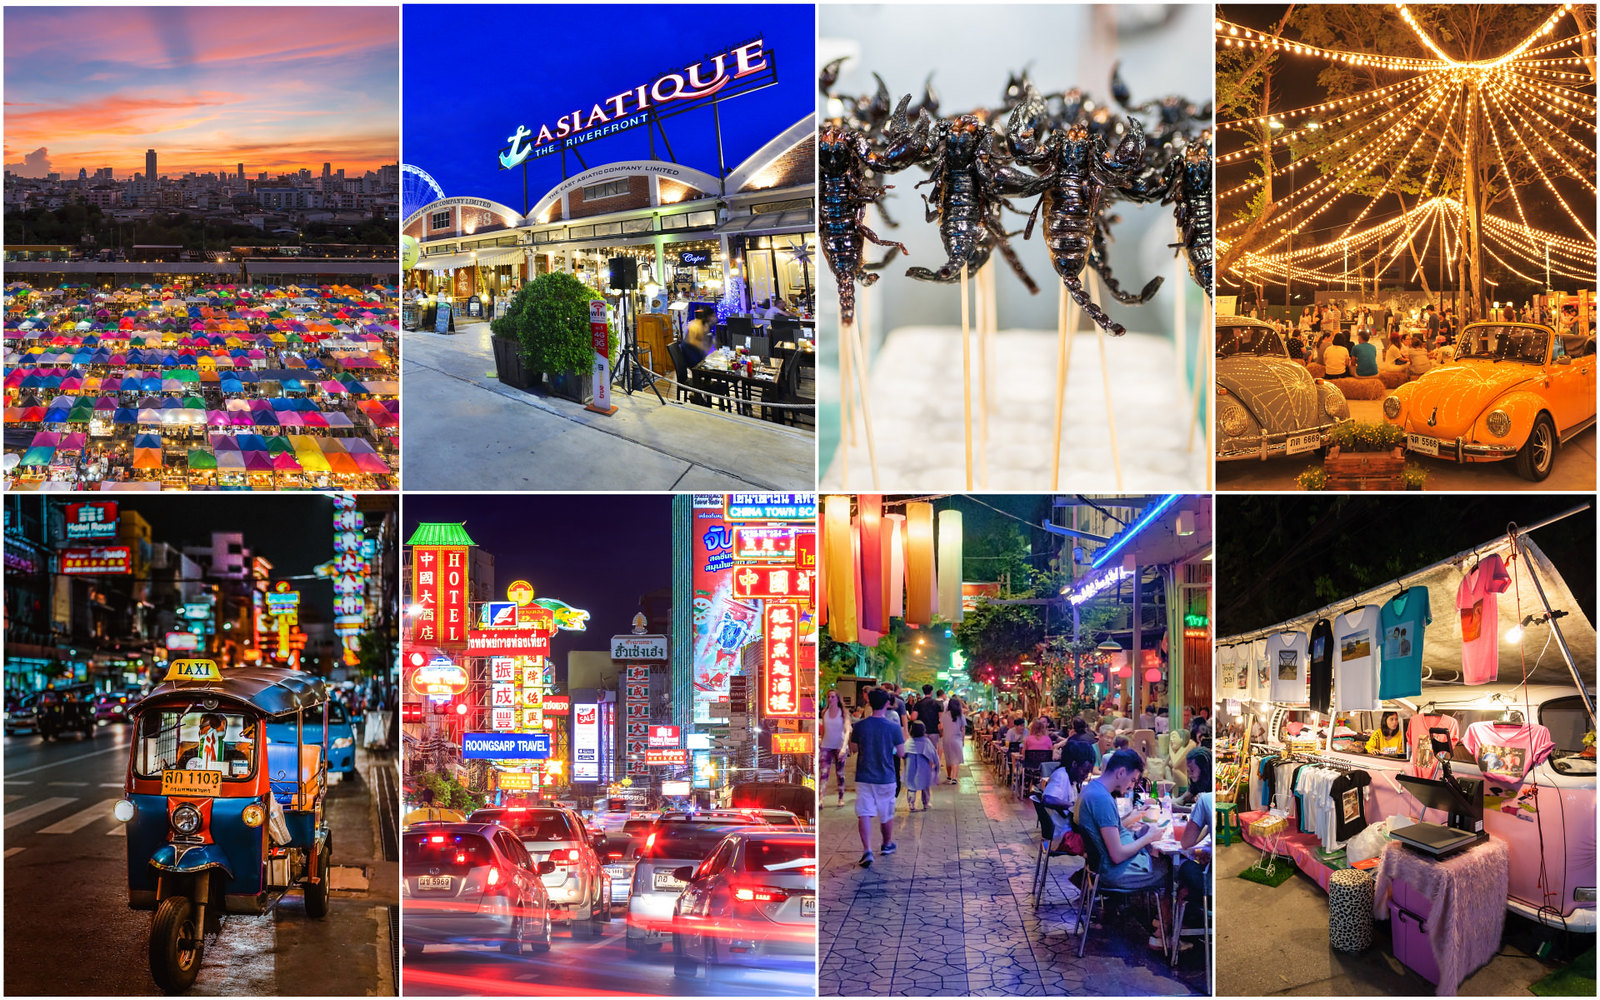 曼谷夜市 Bangkok night markett